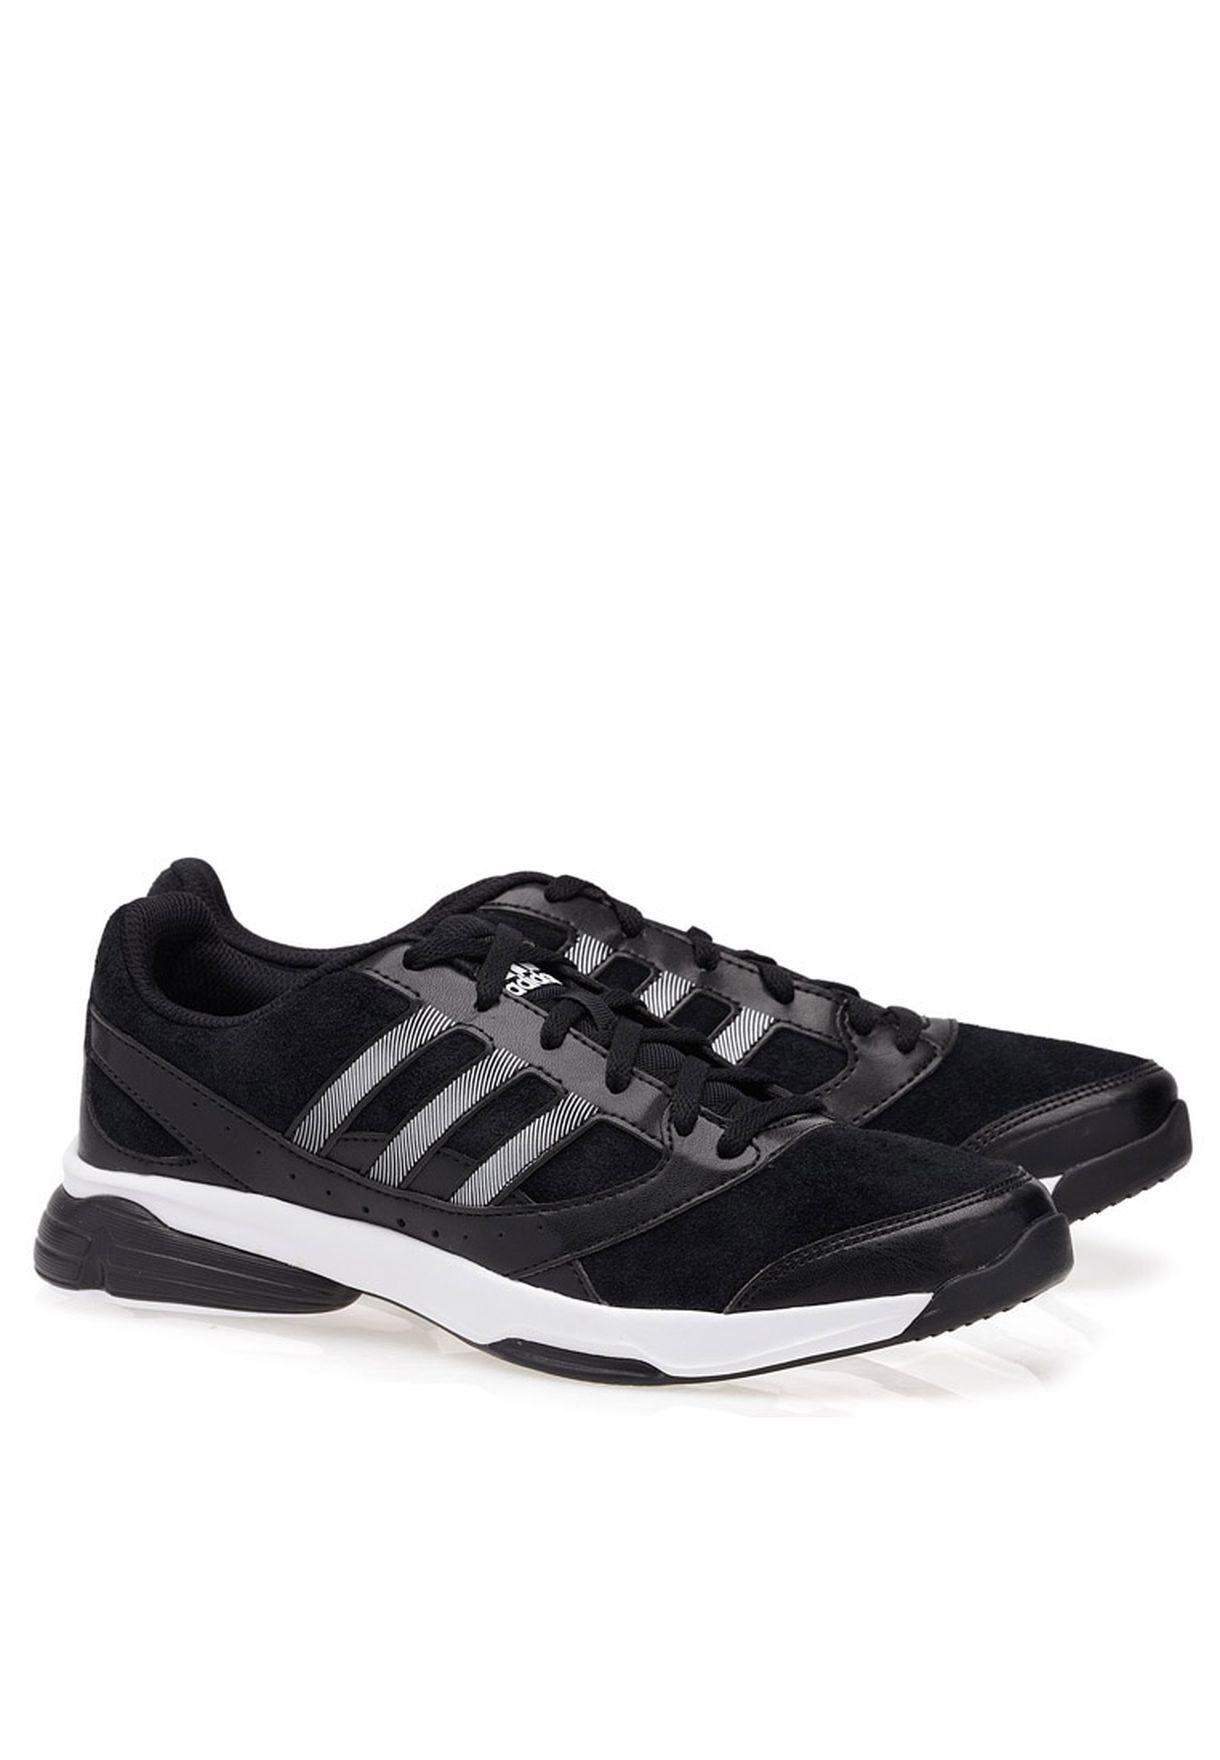 competitive price ed069 05eae Shop adidas black Arianna II Q23212 for Women in Qatar - AD4